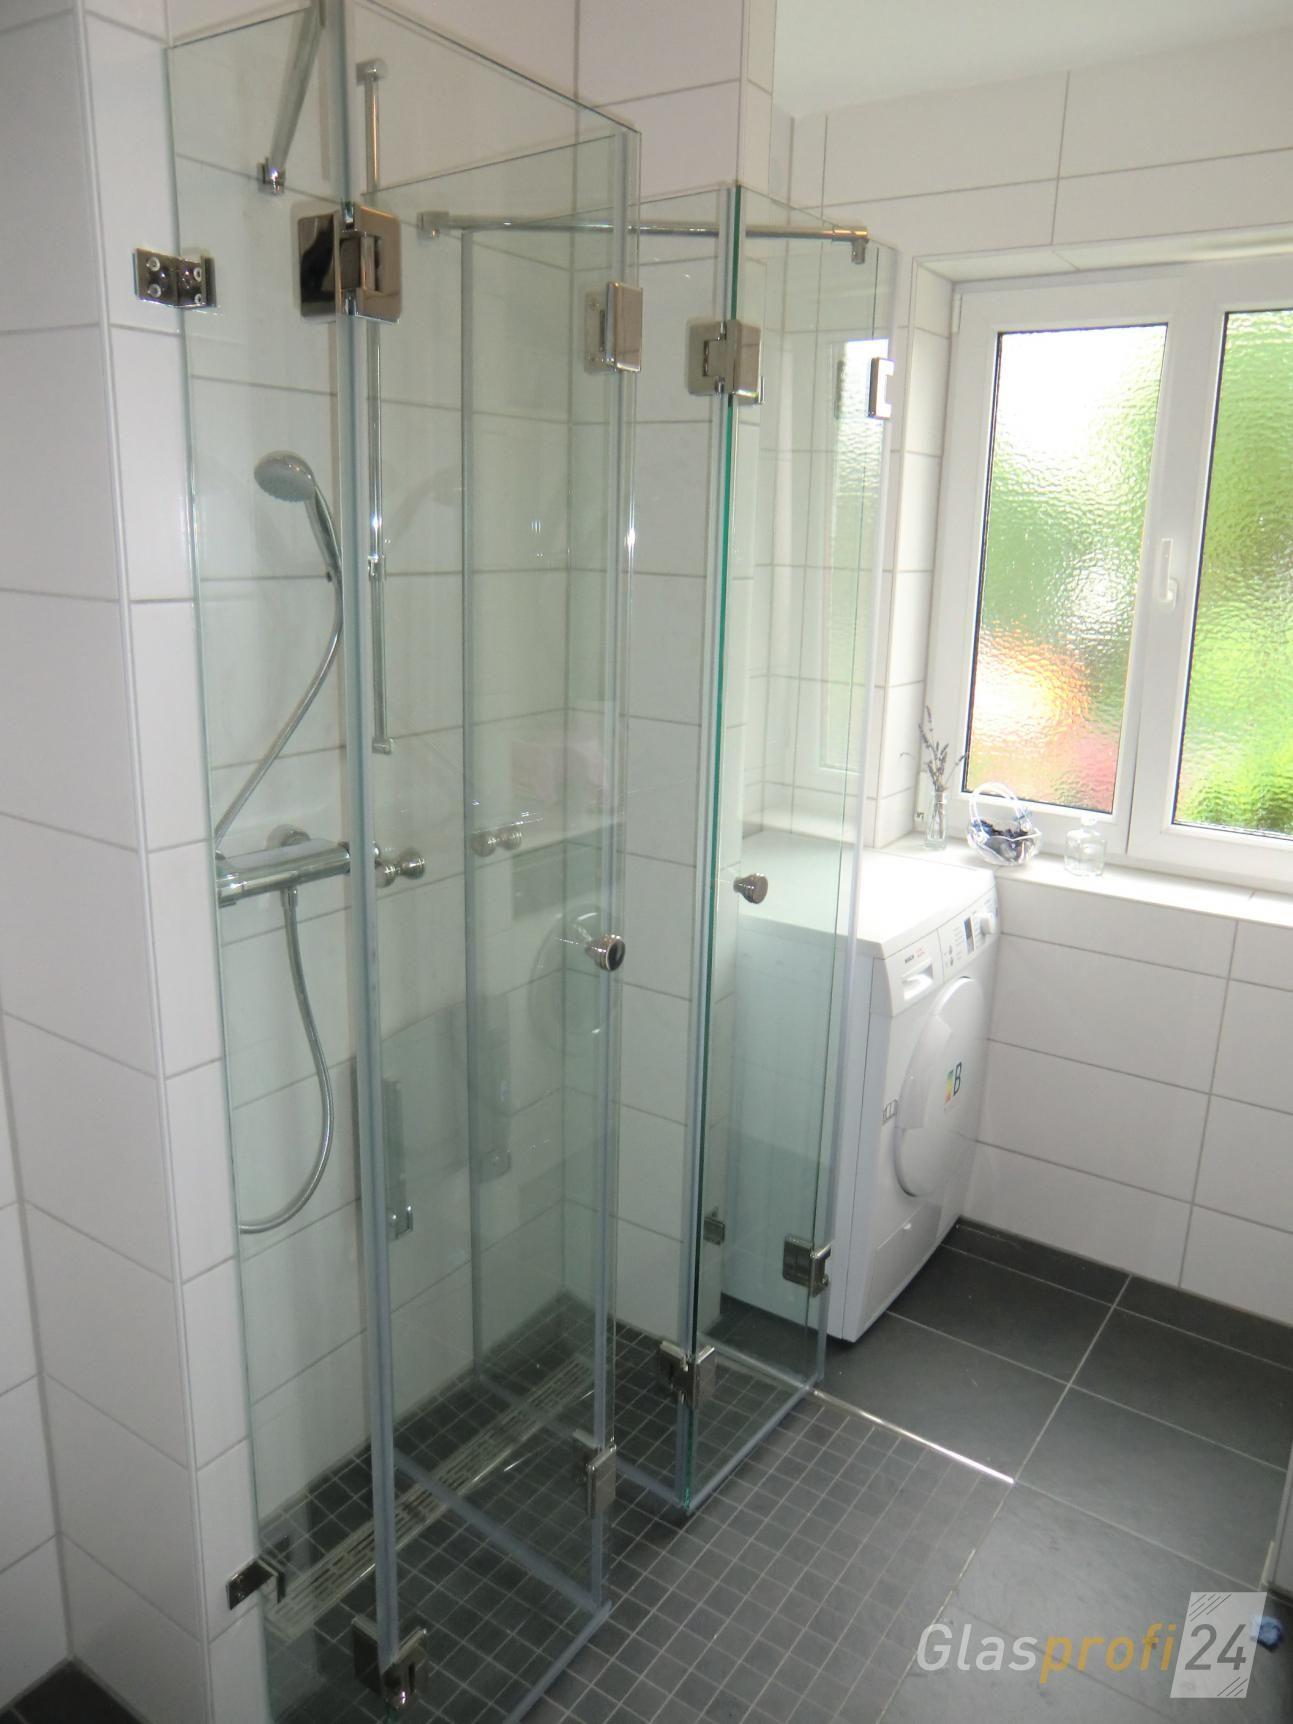 Faltbare Duschkabine aus Glas GLASPROFI24 Duschkabine